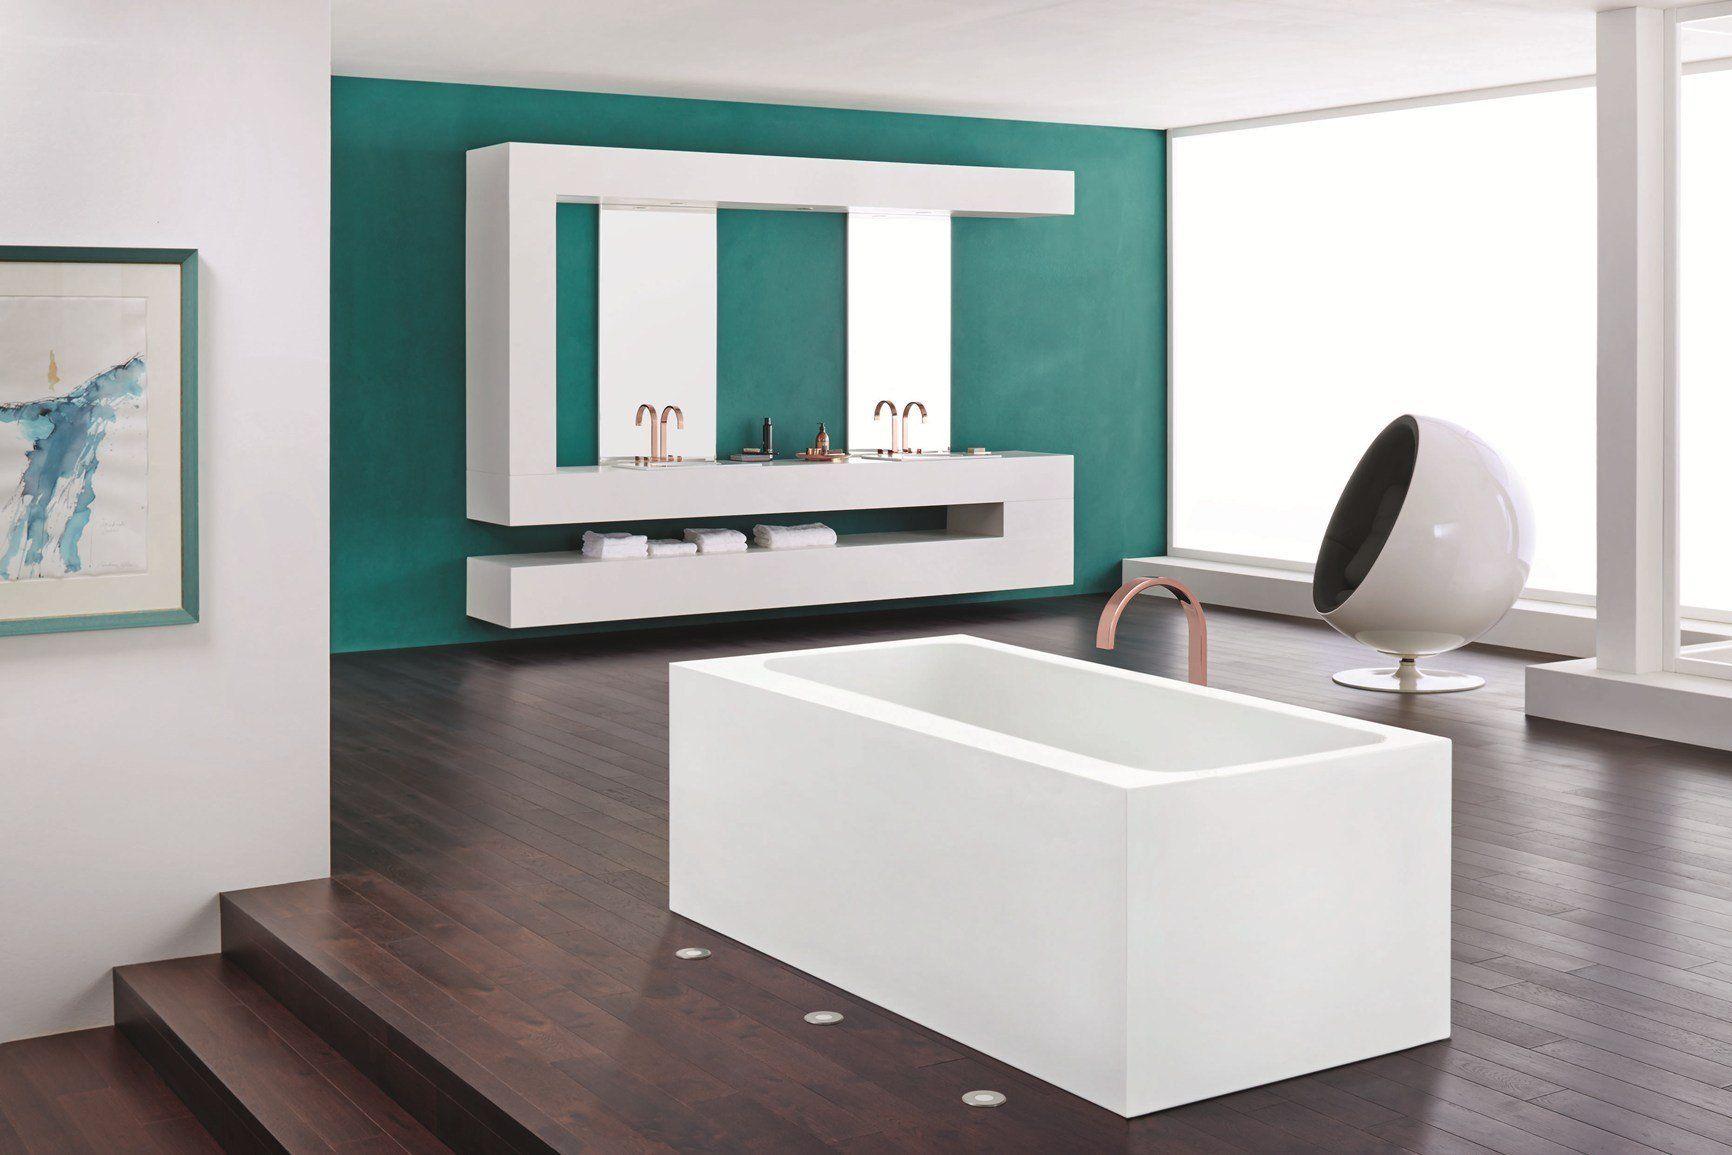 Vasca Da Bagno Kaldewei Dimensioni : Superfici continue rivestono le vasche freestanding kaldewei